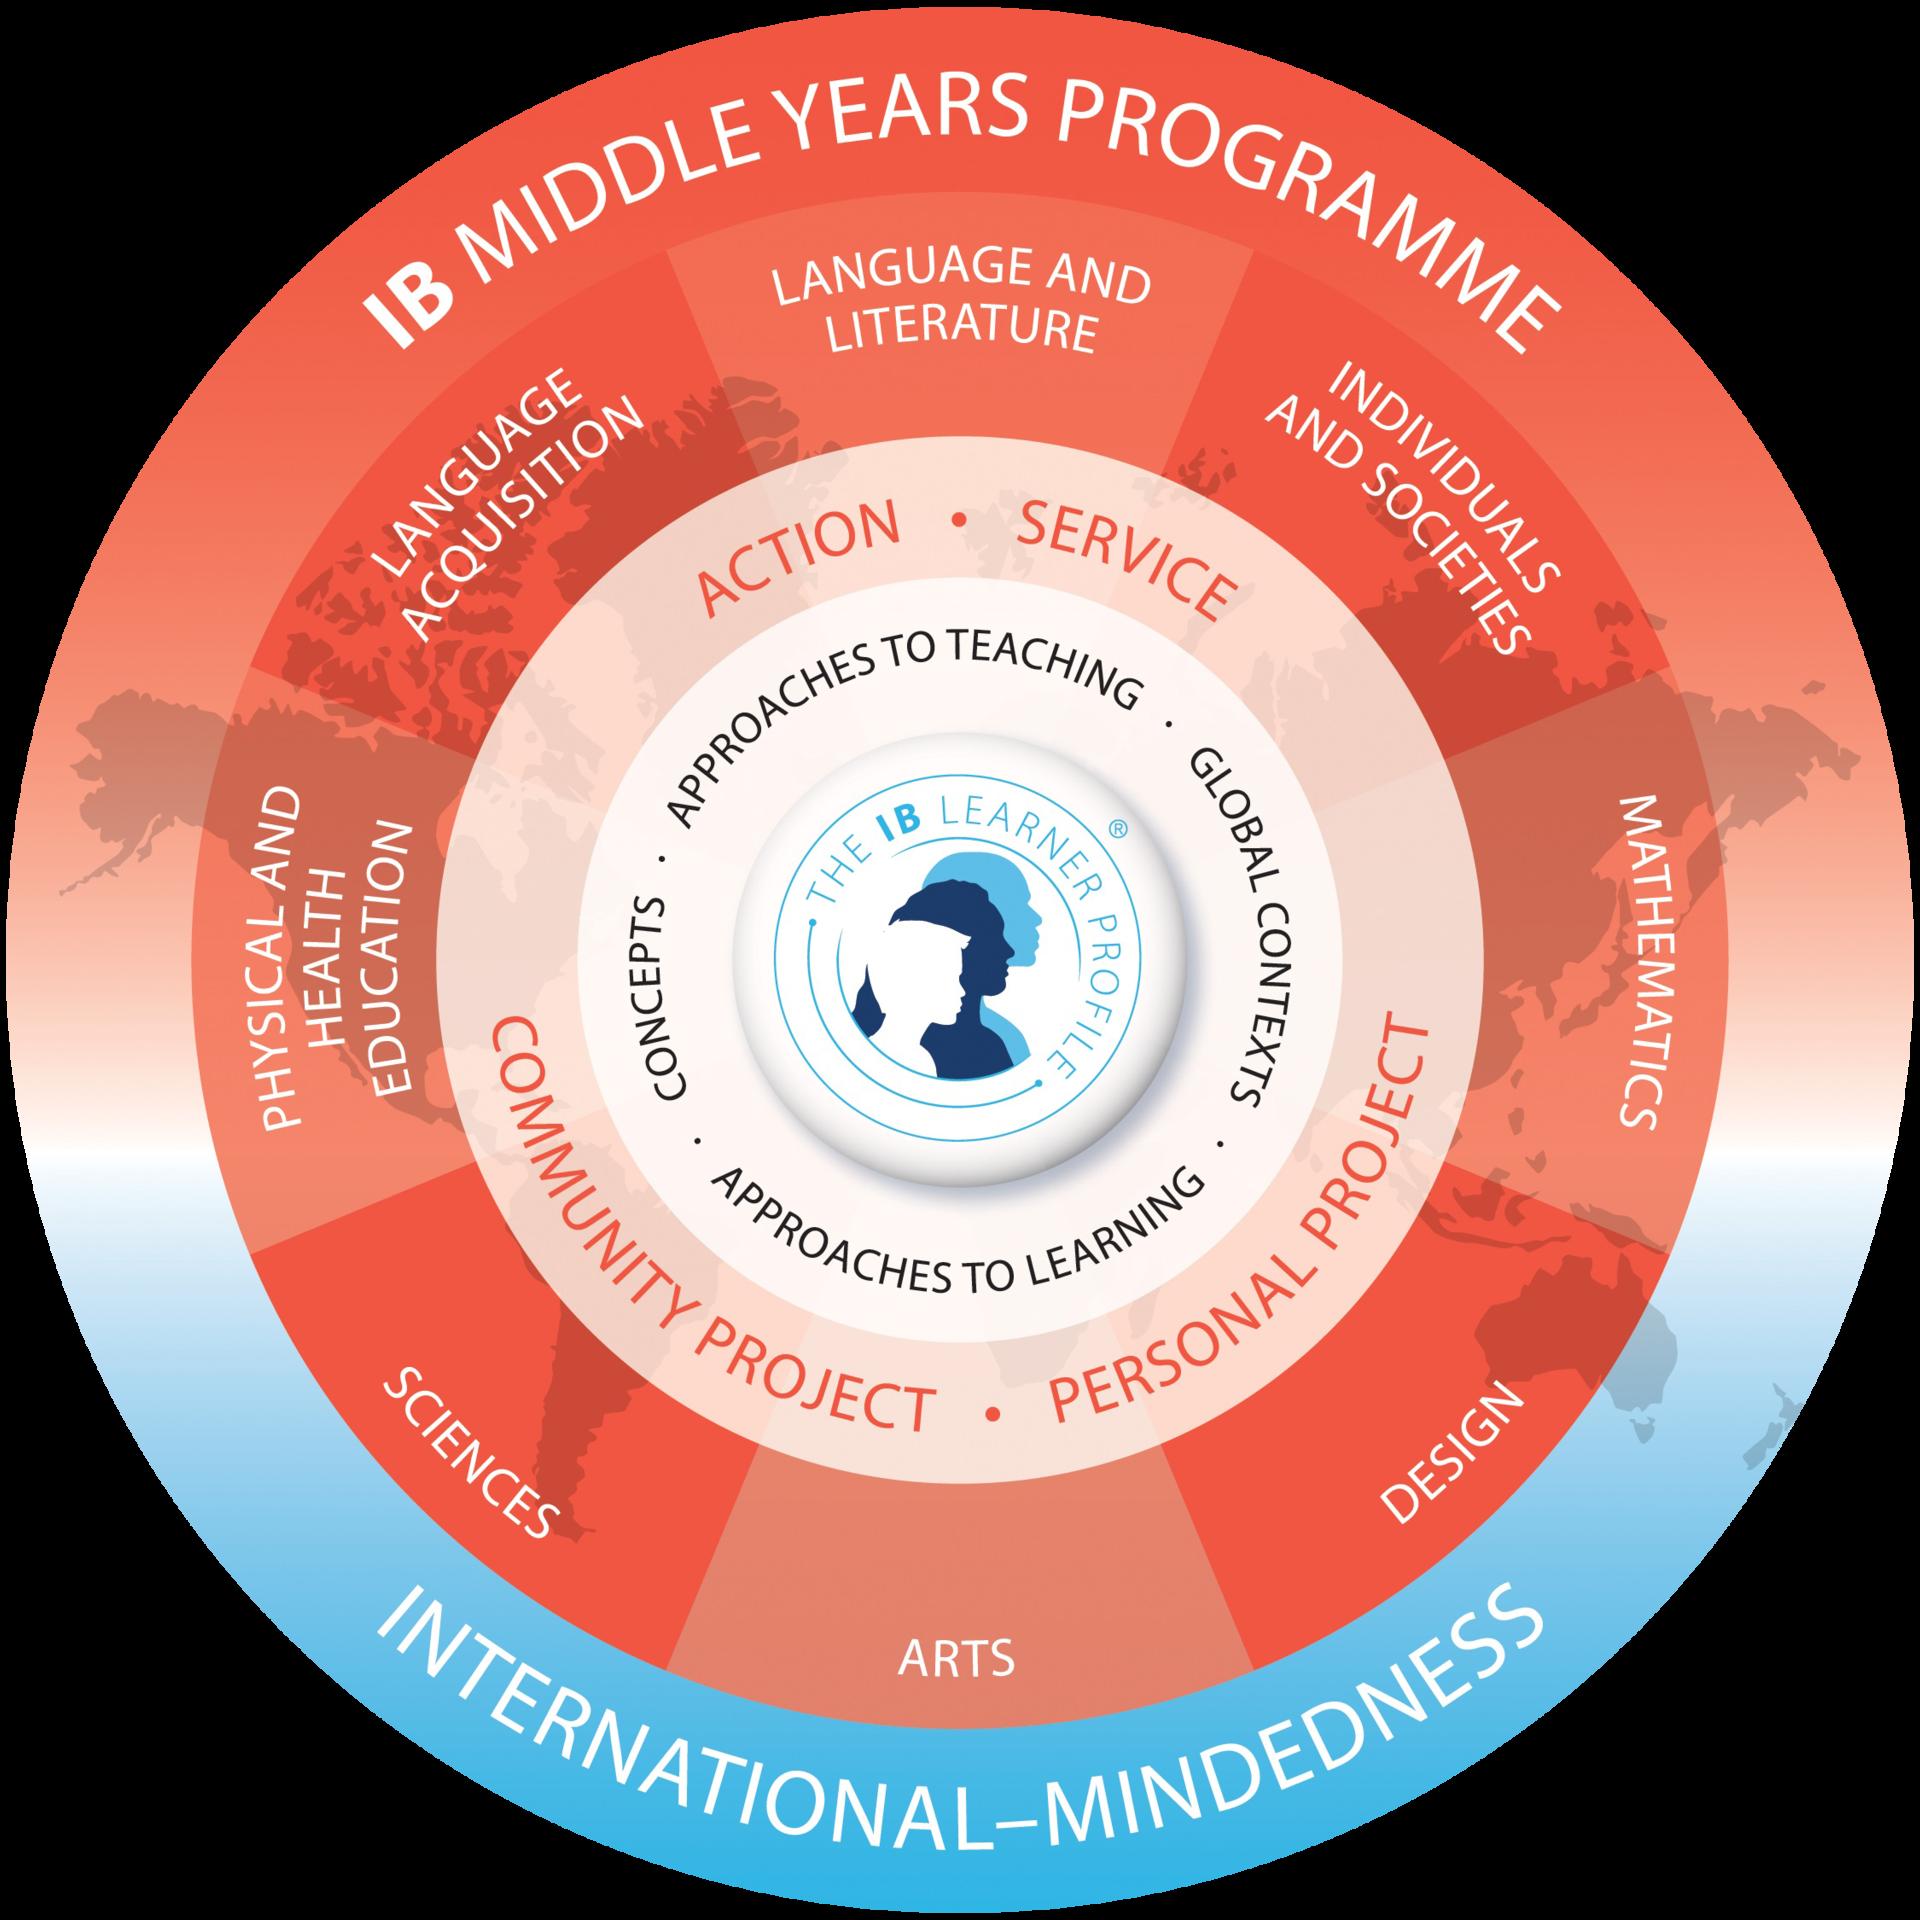 IB Middle Years Program (IBMYP) – International Baccalaureate (IB